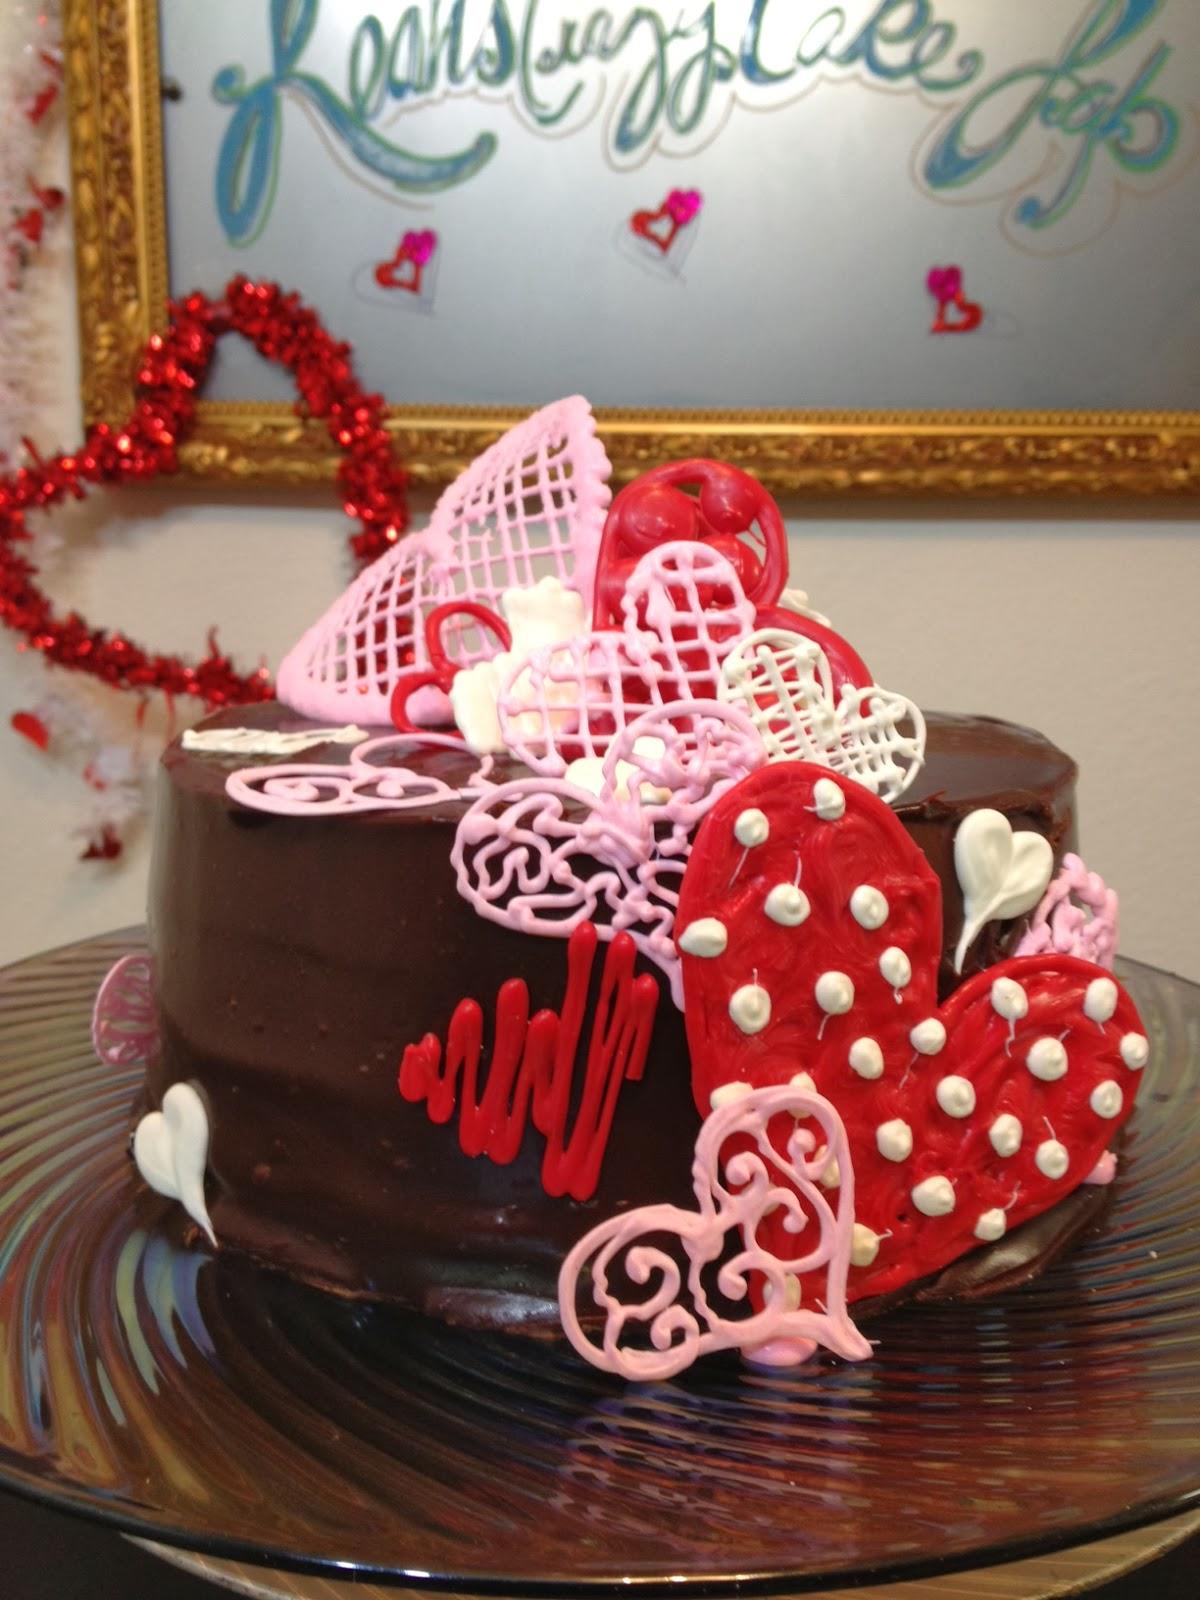 Chocolate Ganache Cake Decorations